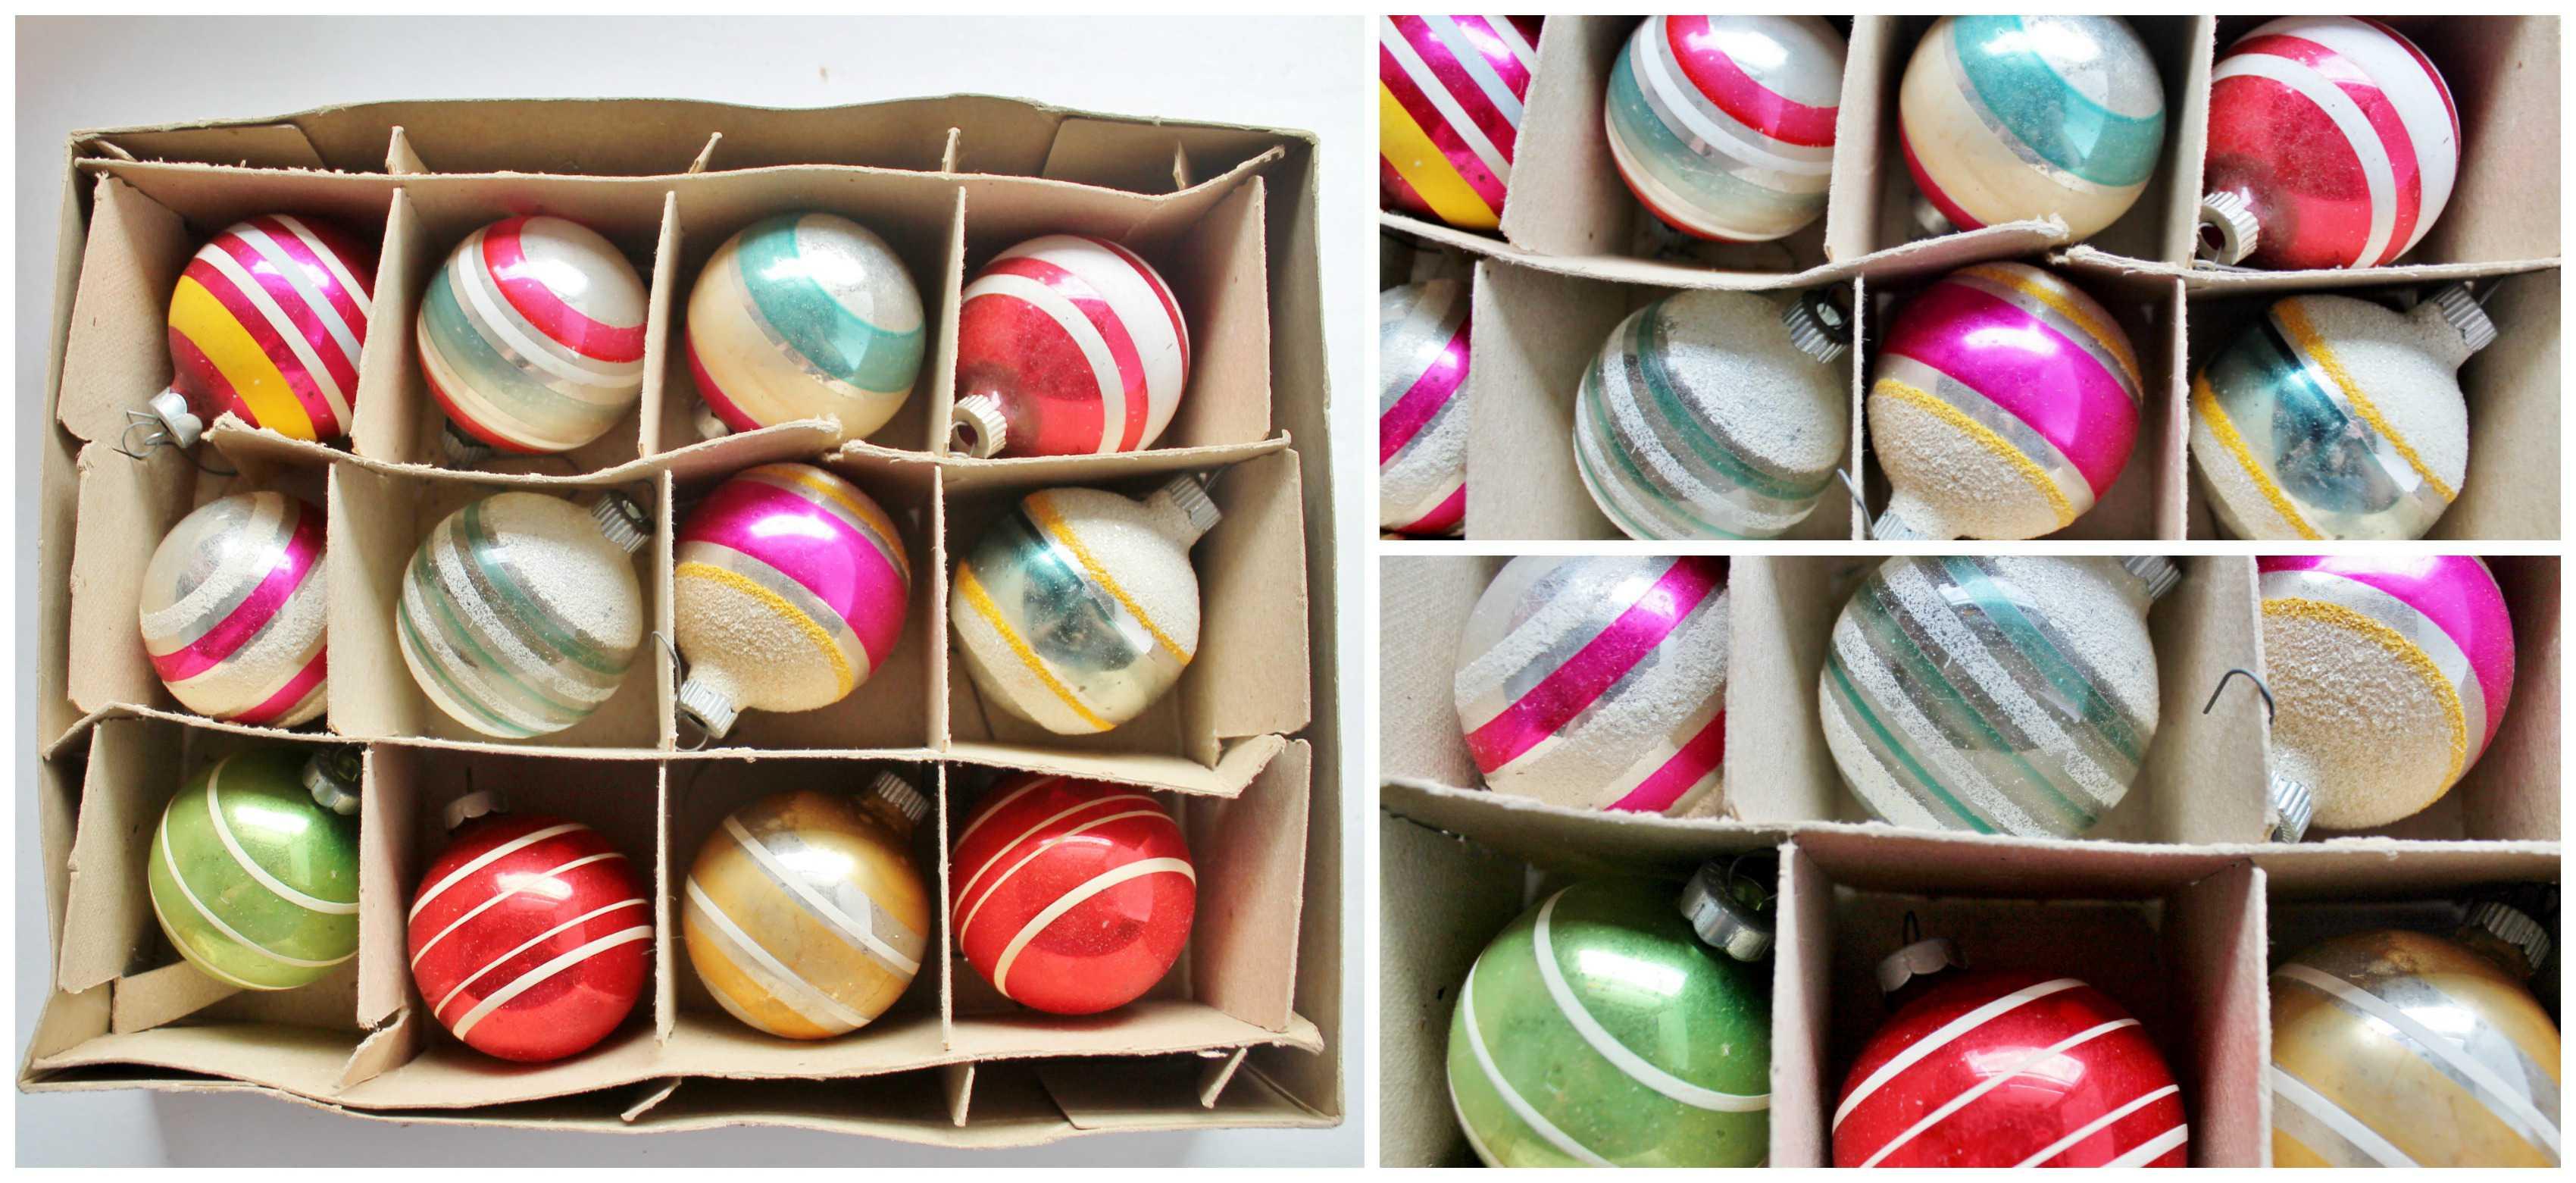 Vintage Striped Shiny Brite Ornaments (12) Collage